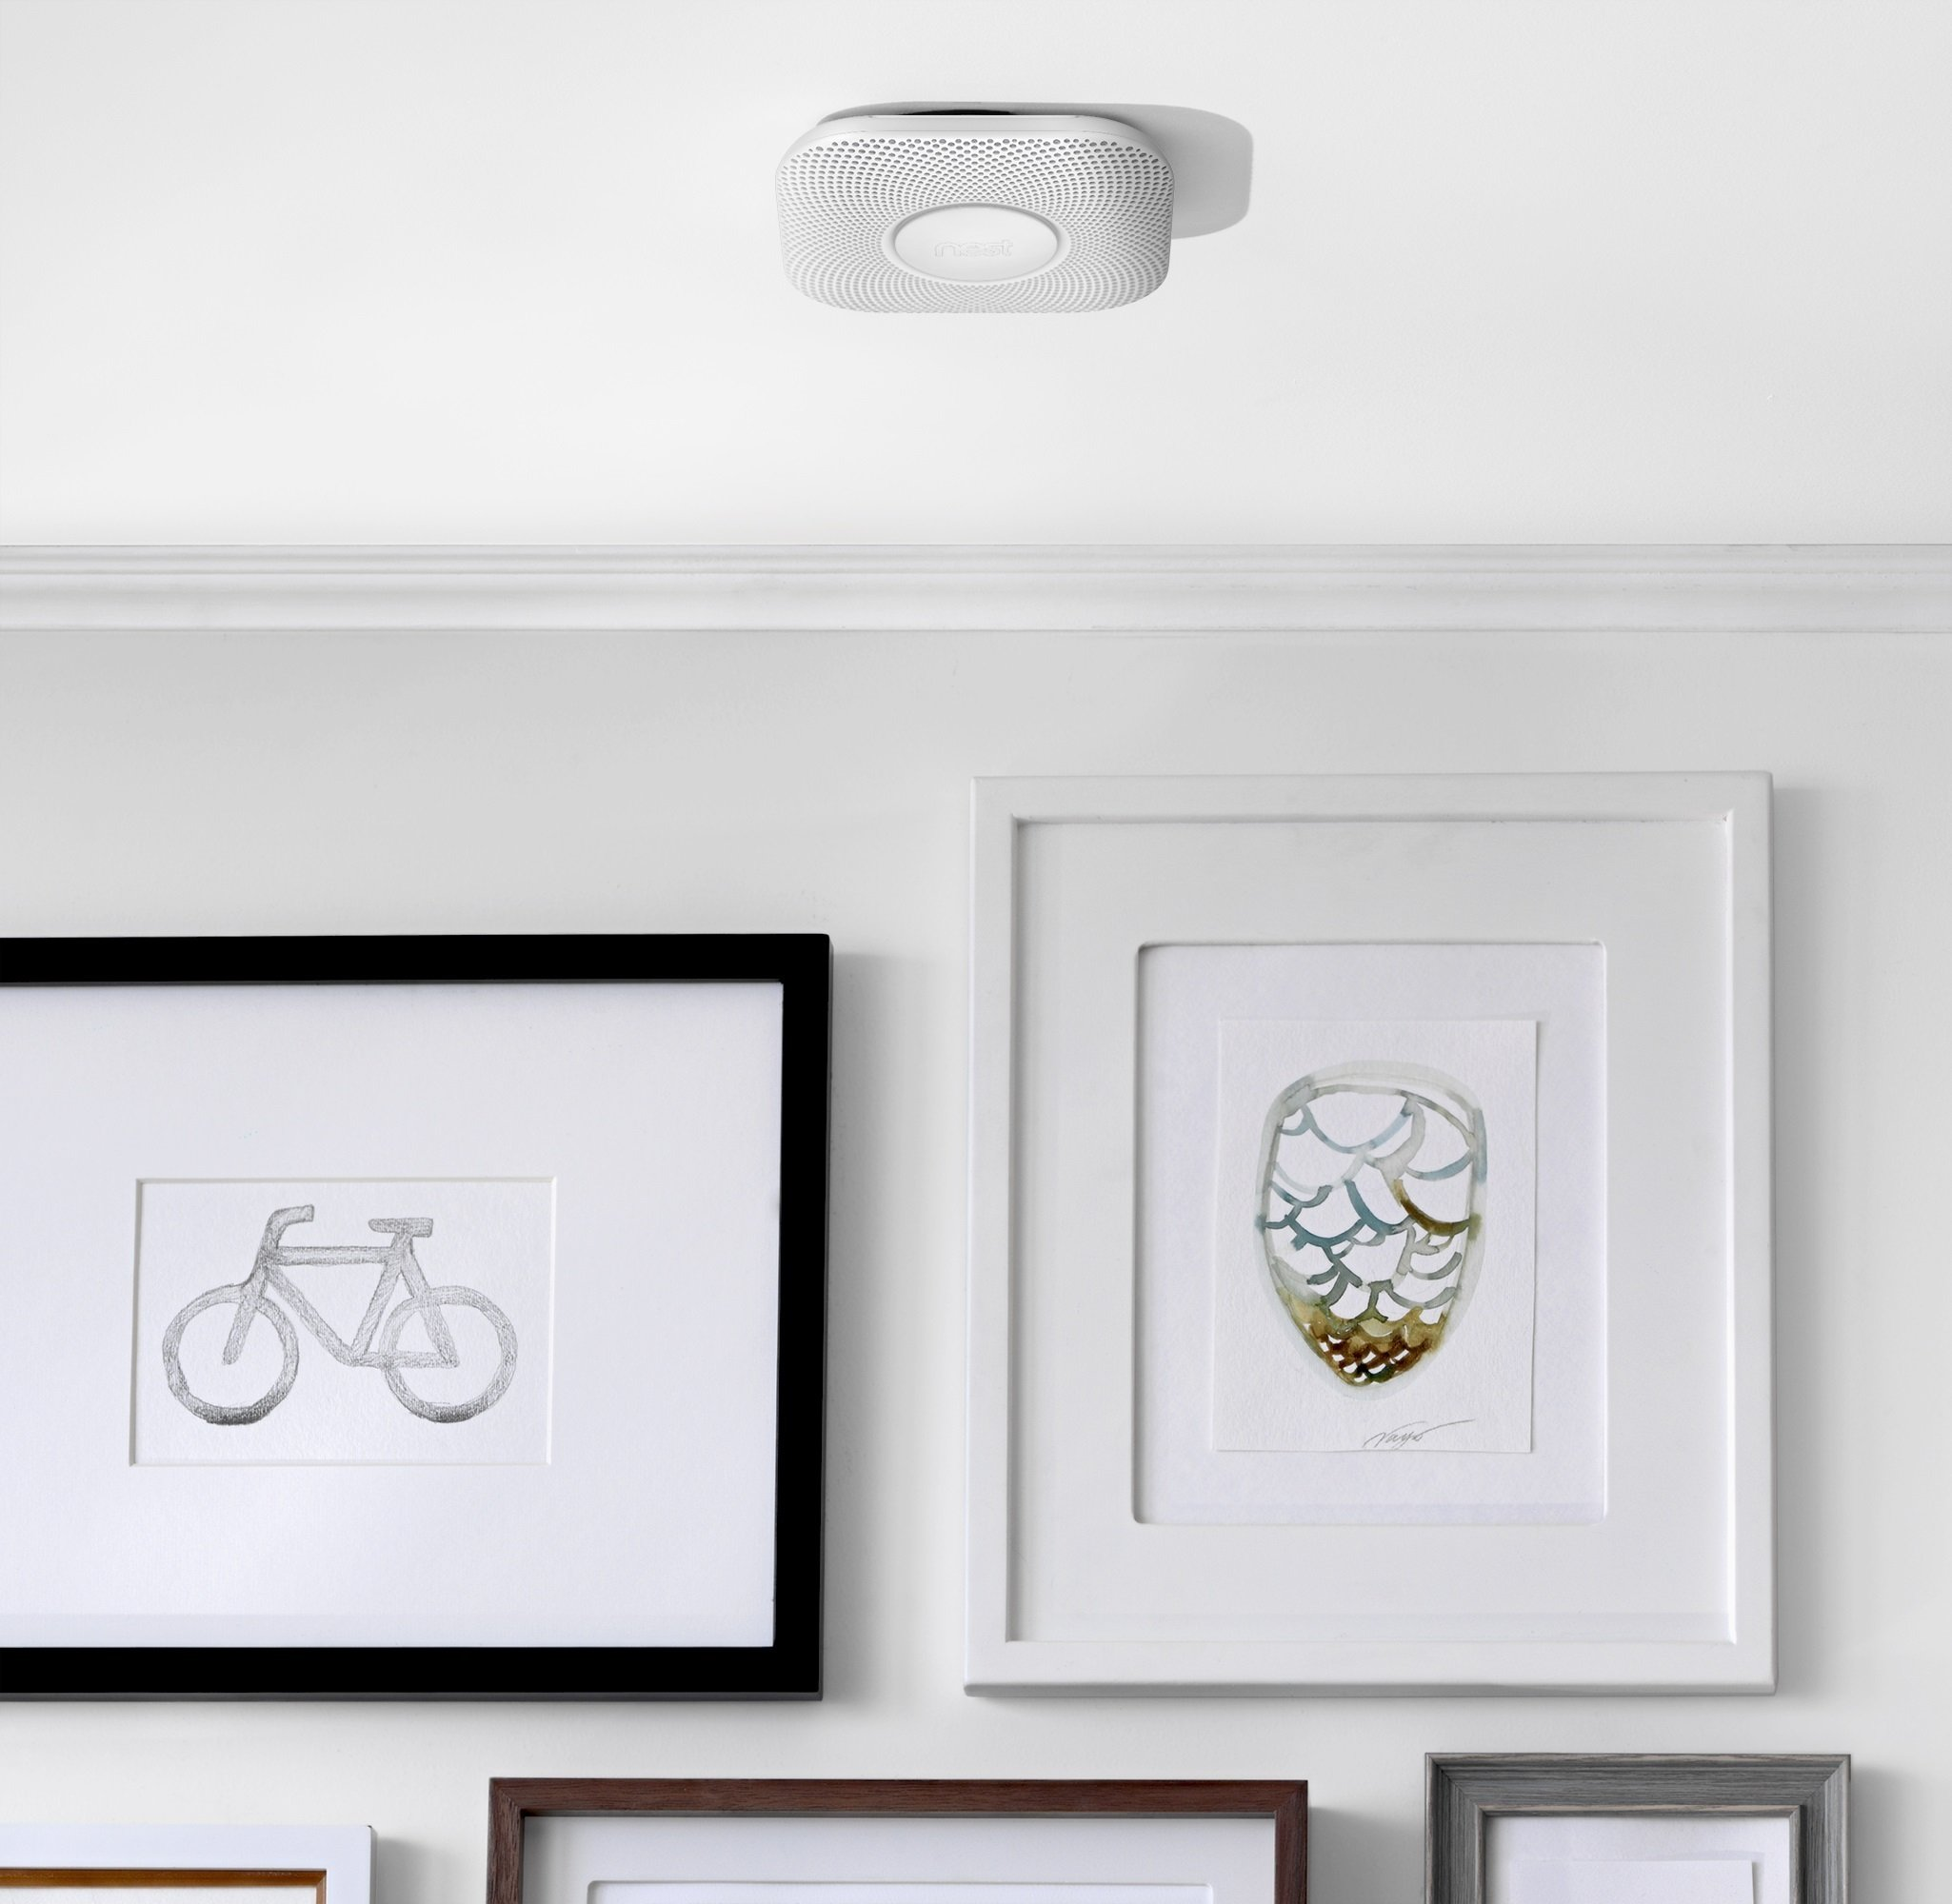 Nest Protect Smoke & Carbon Monoxide Alarm, Battery (2nd gen) by Nest